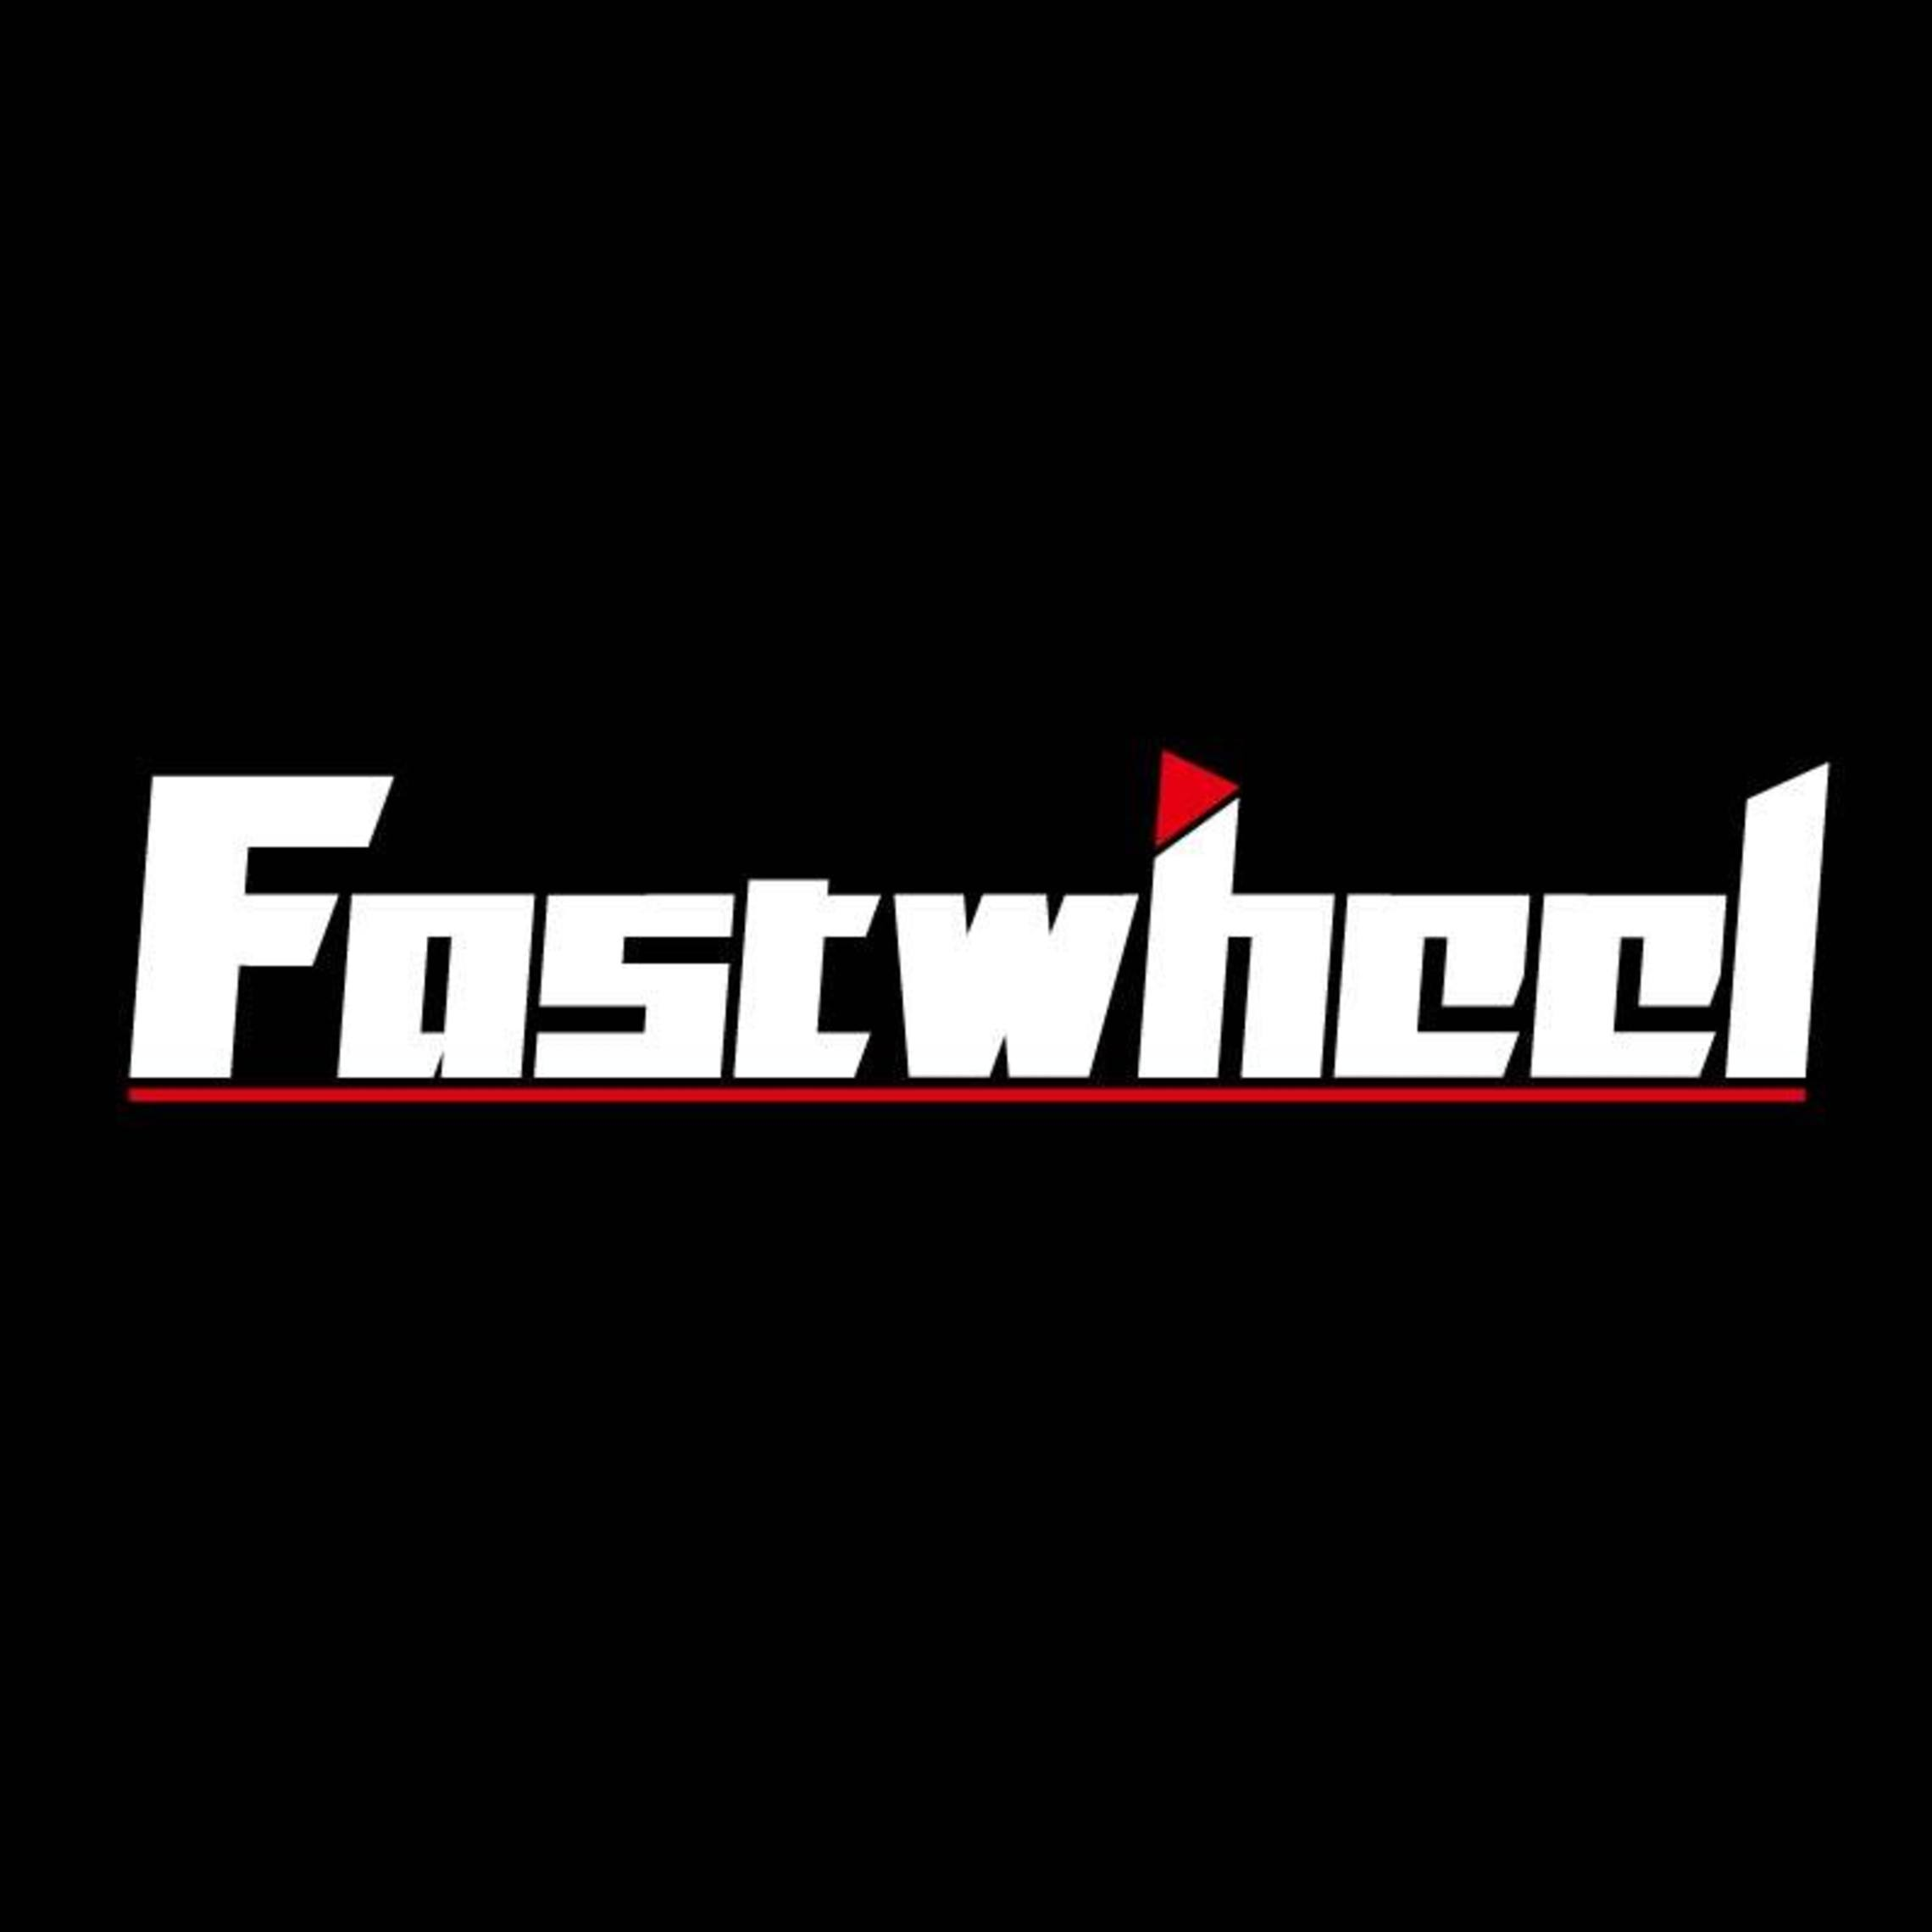 fastwheel motors- company logo